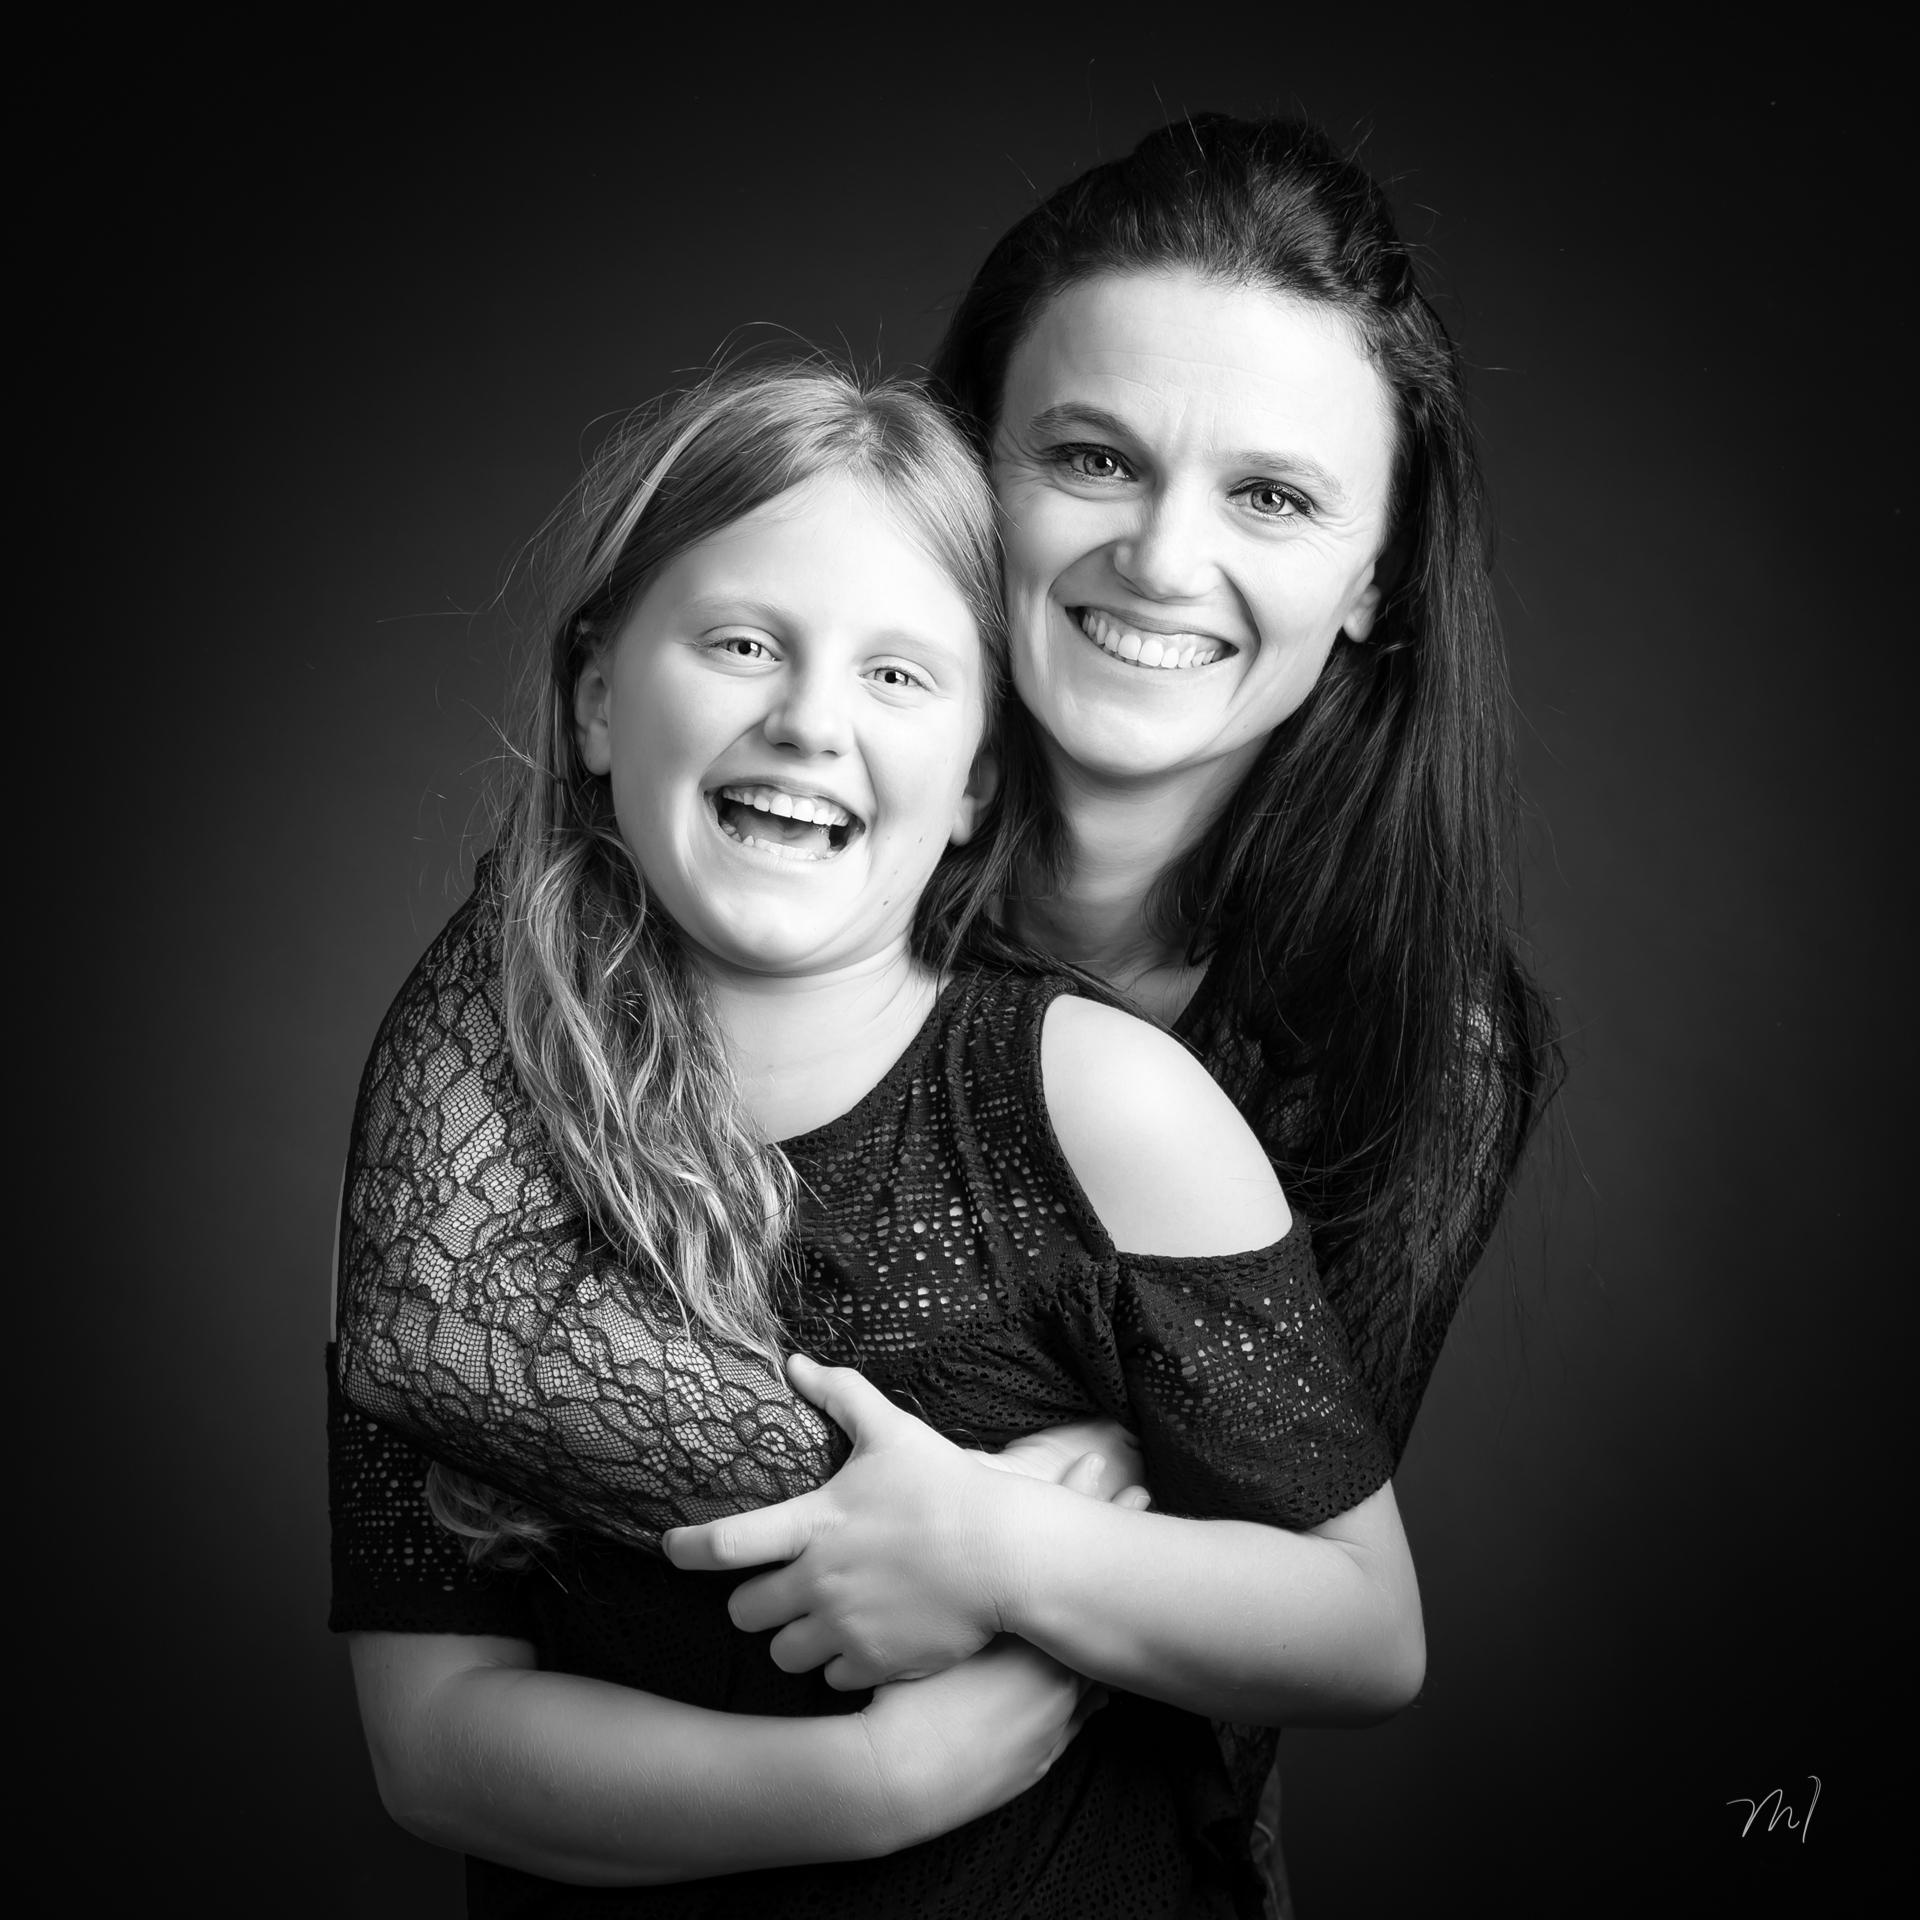 Familles & enfants - Marie Ismalun photographe-25